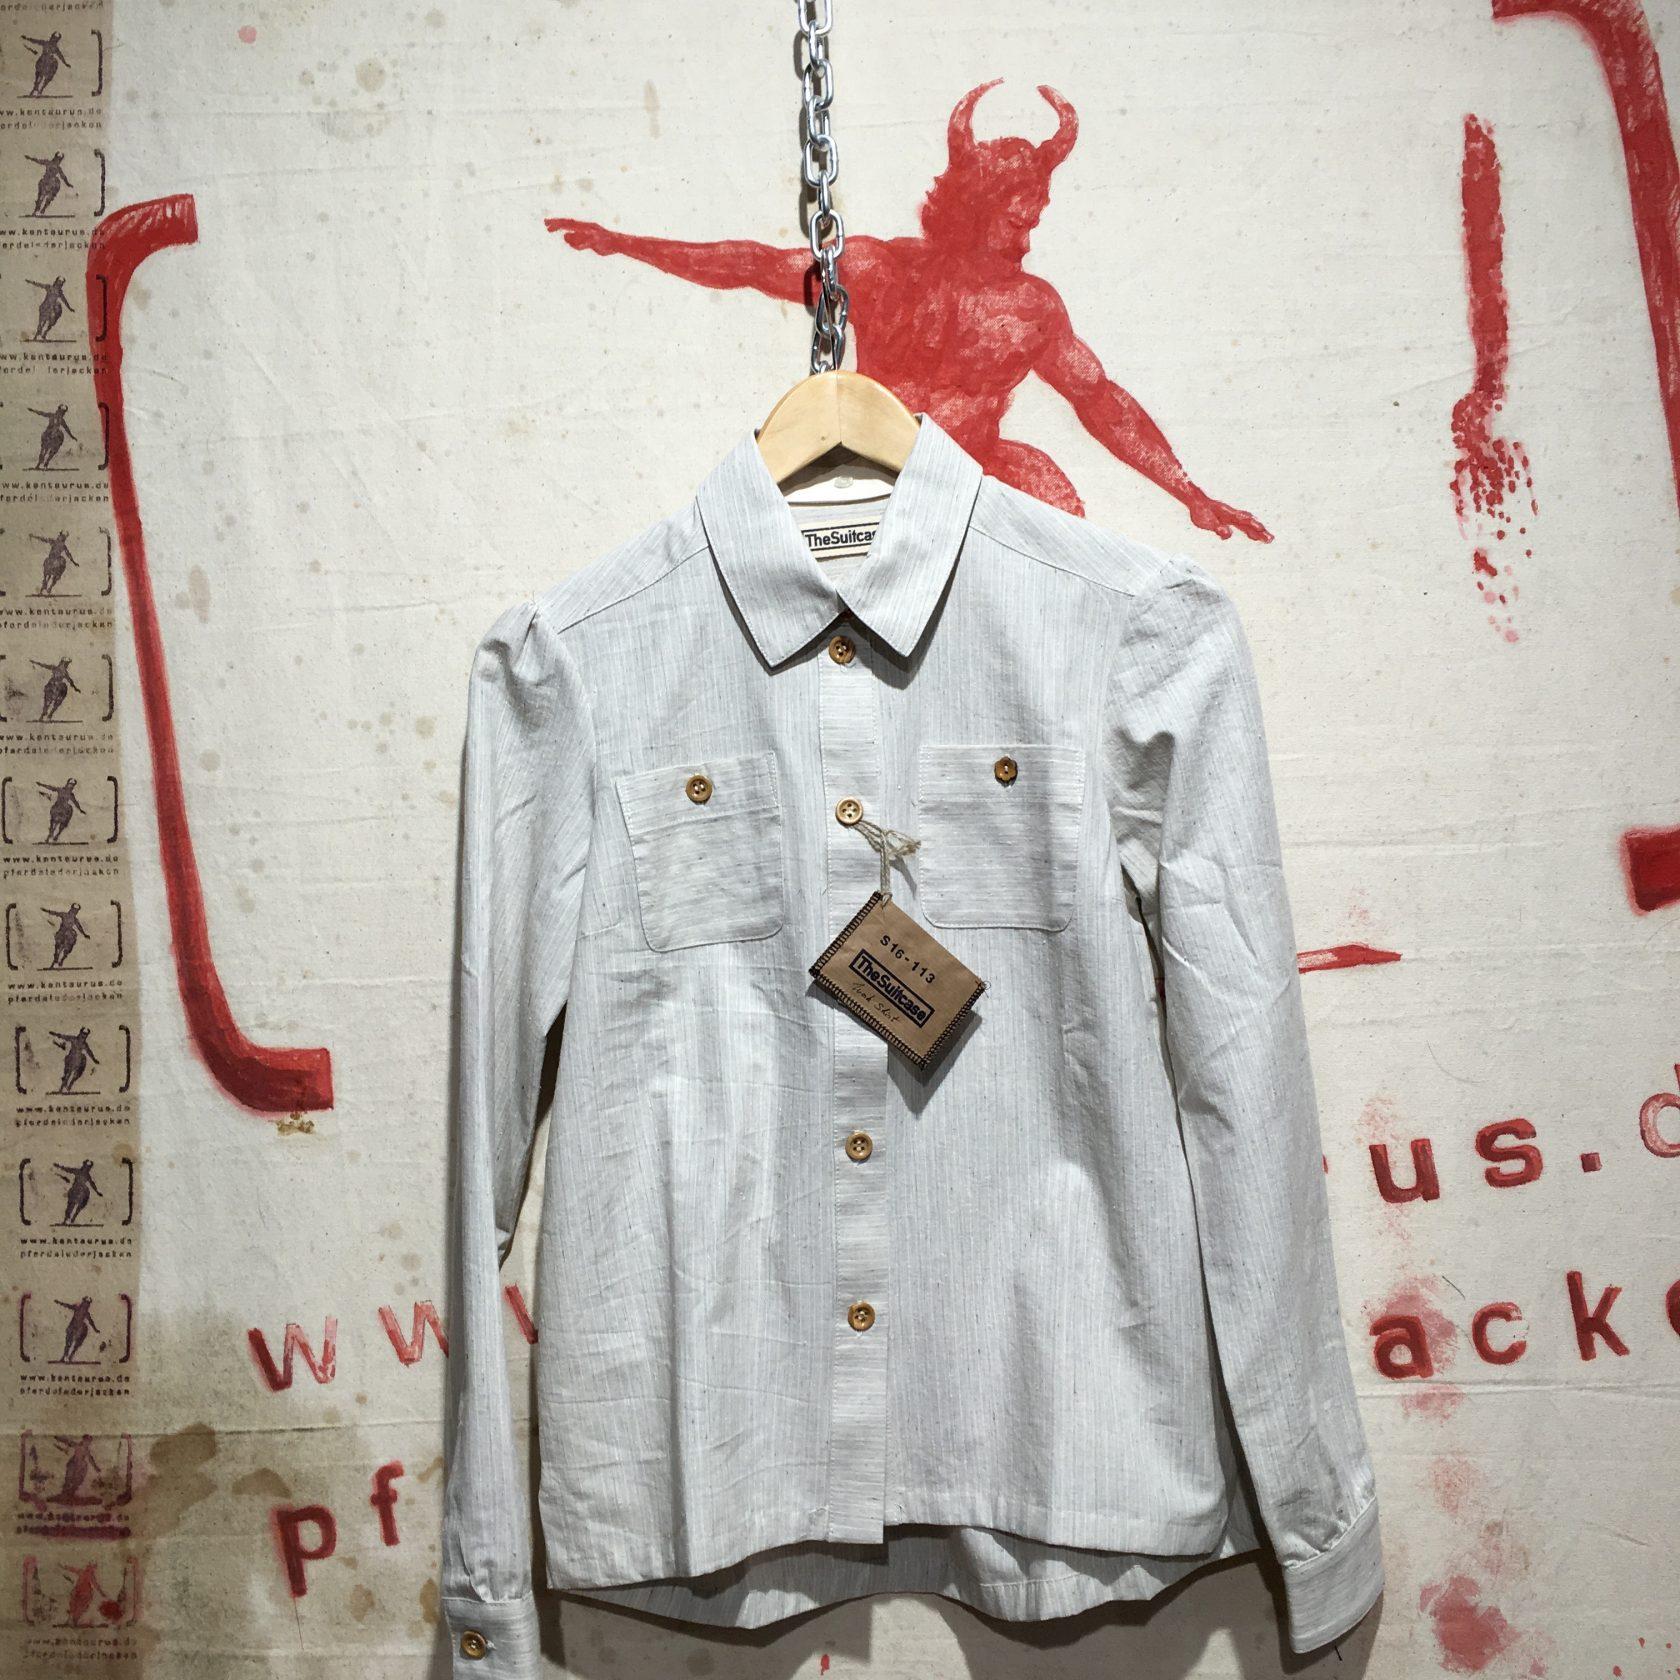 Suitcase work shirt